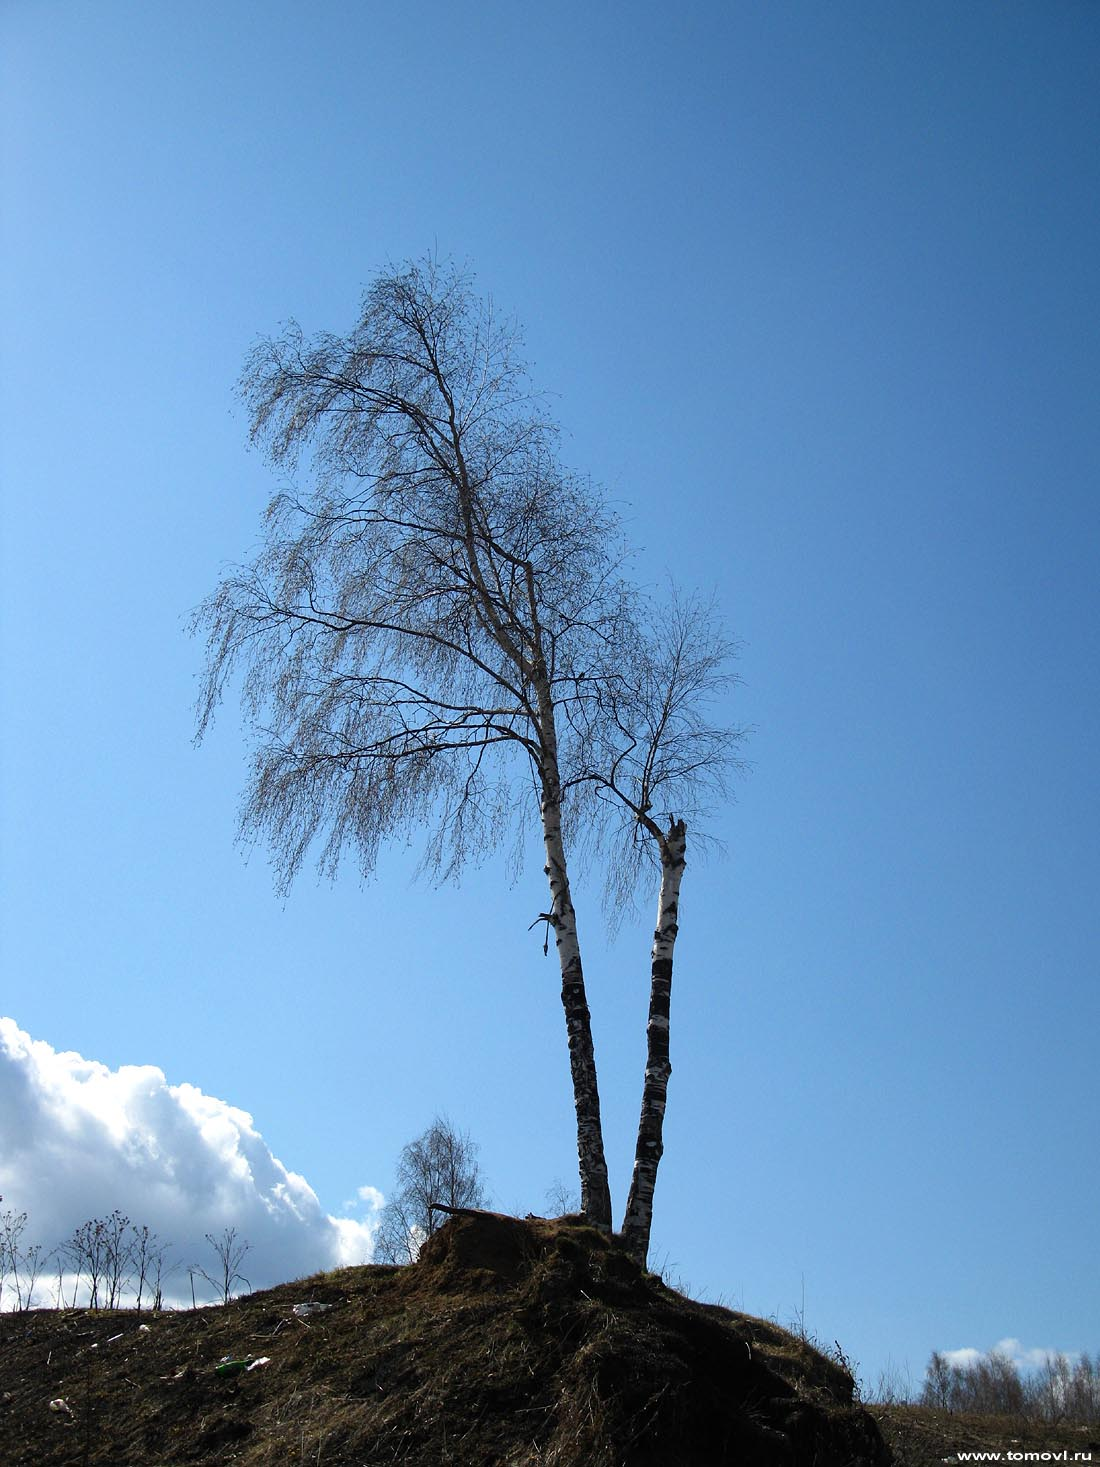 Источник картинки - http://www.tomovl.ru/fishingline_bereza.html